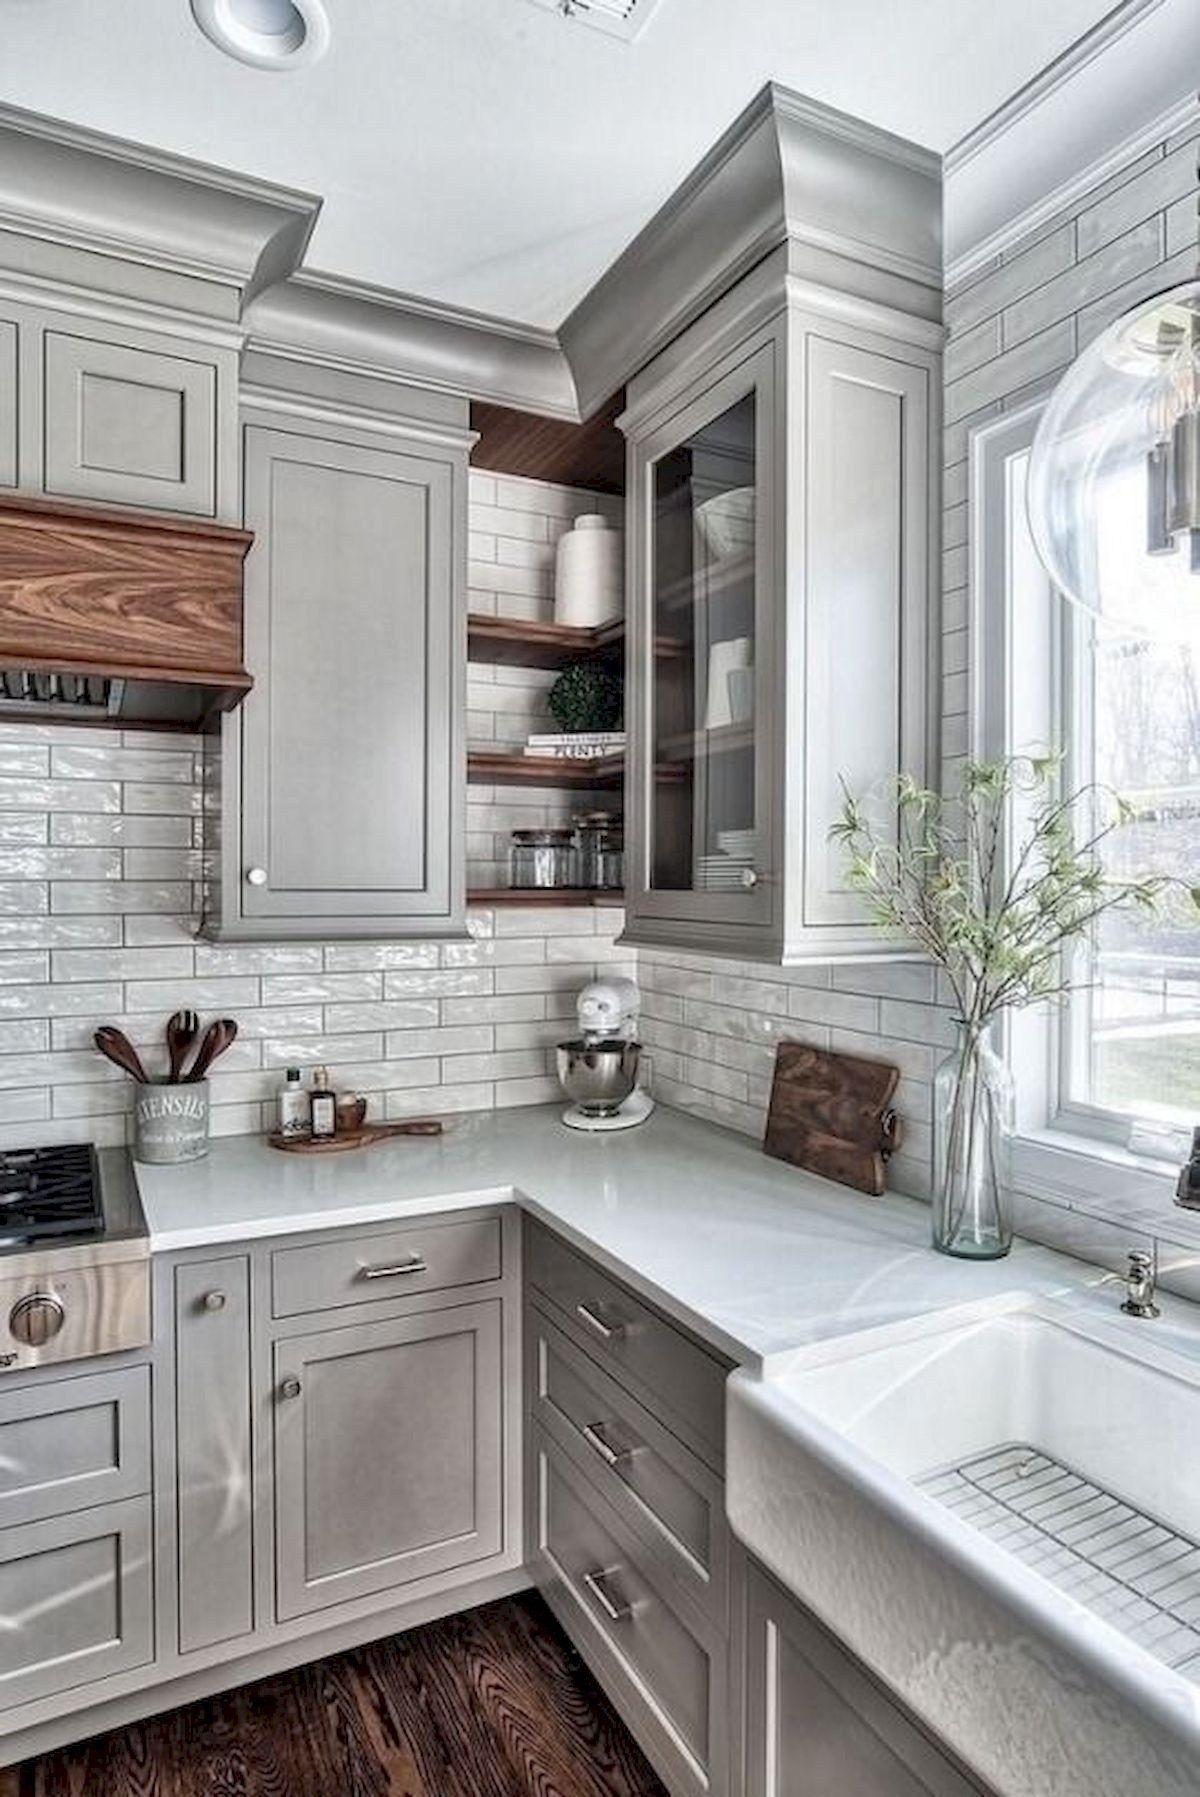 44 Best Farmhouse Kitchen Cabinets Design Ideas And Decor 33